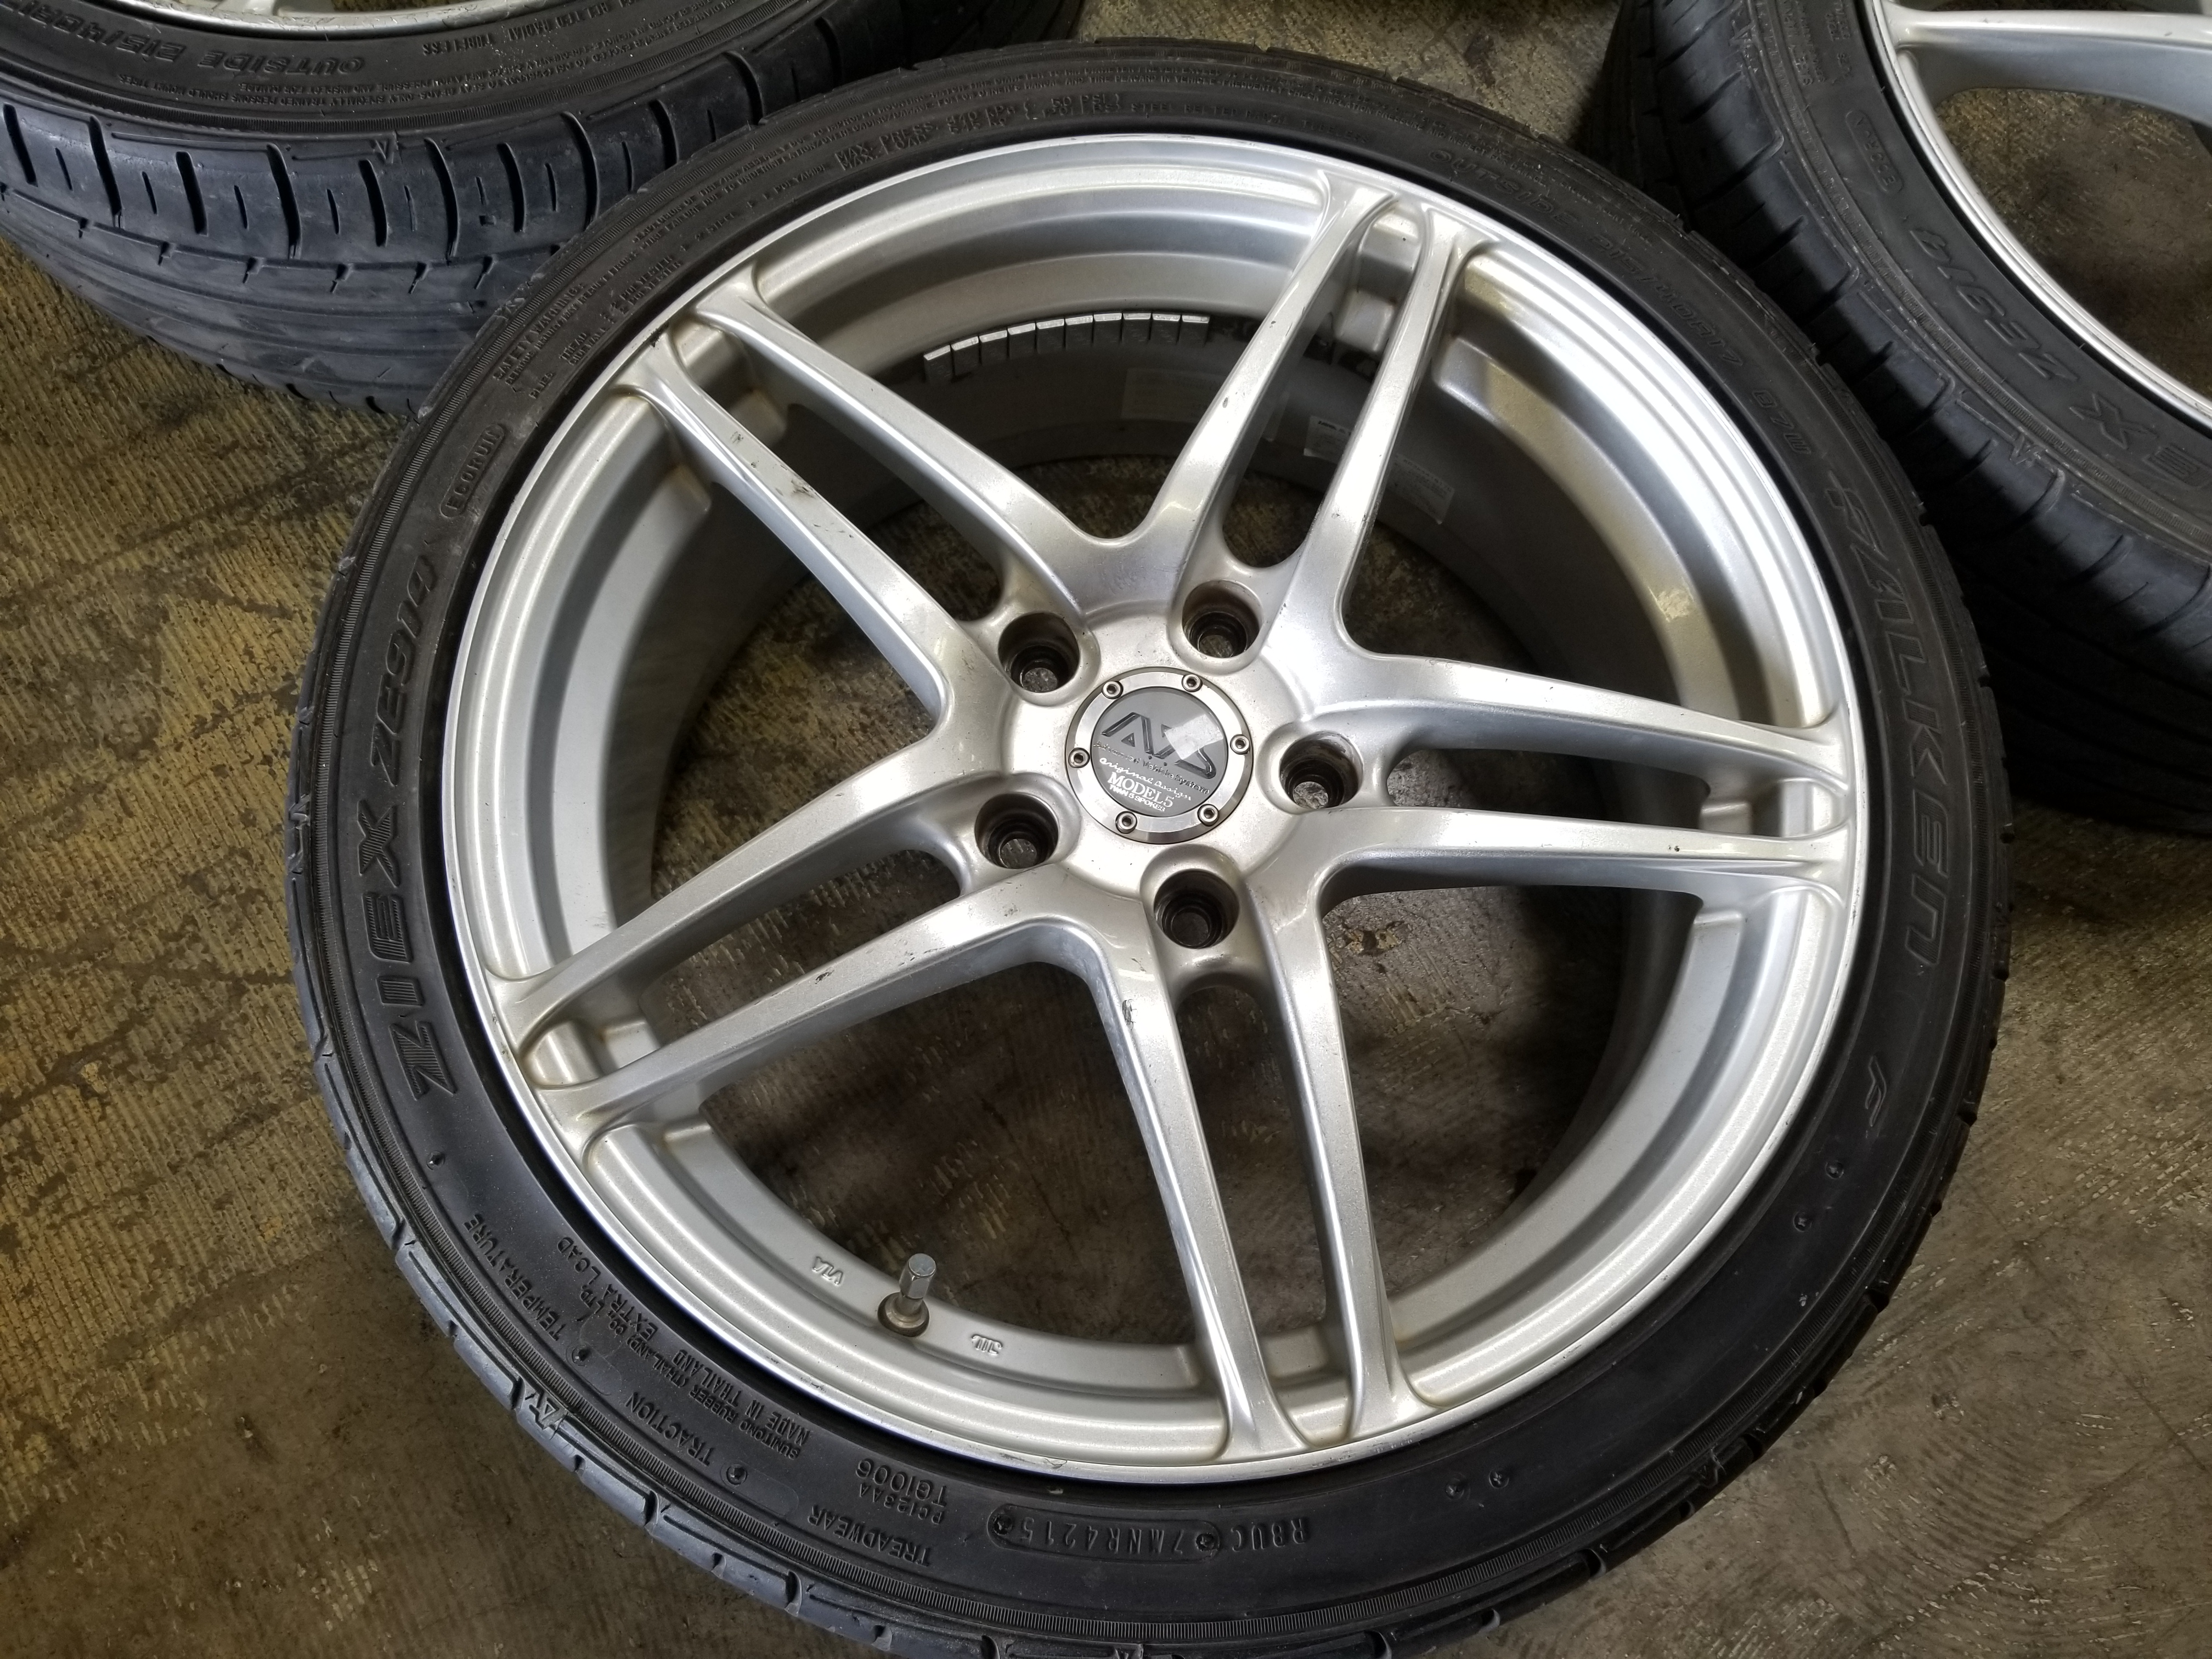 Honda Chula Vista >> 17×7 +45 5×114.3 Yokohoma Advan Model 5 Twin 5 Spoke 215 40 17 Falken Ziex Wheel   JDM Of San Diego